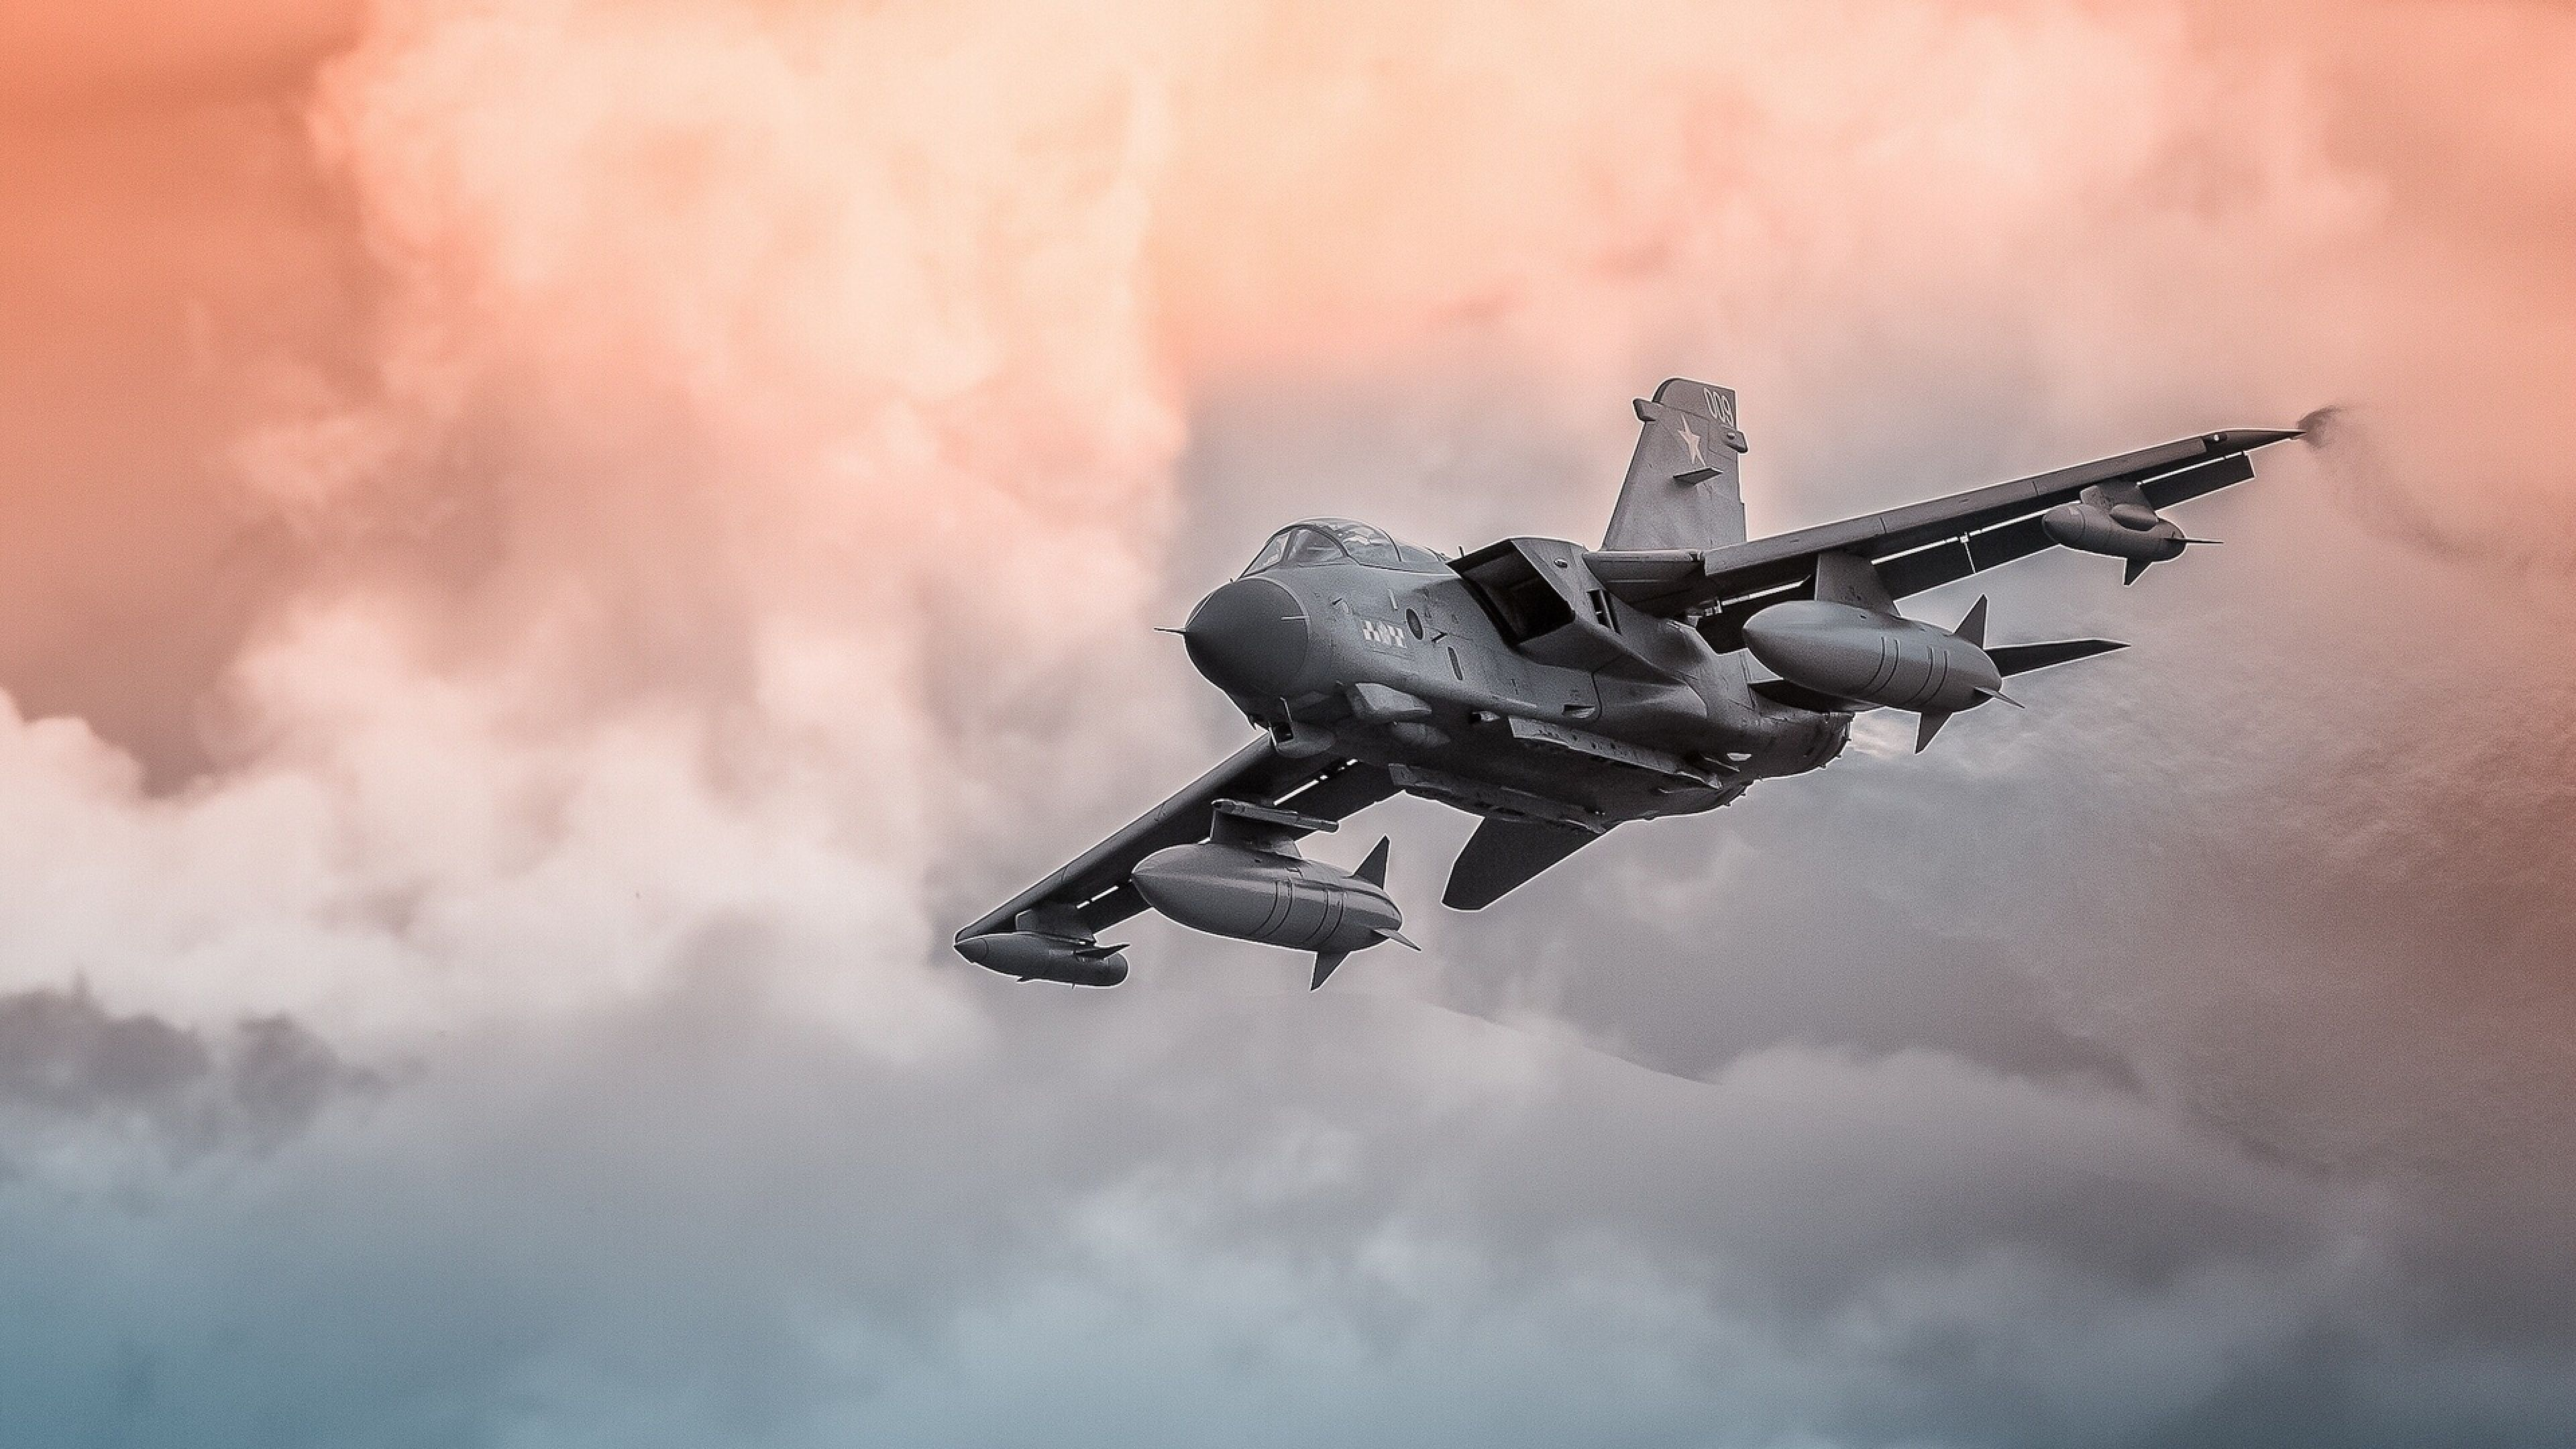 Military Helicopter 4k Hd Desktop Wallpaper For 4k Ultra: Tornado GR4 Ultra HD 4k Wallpaper